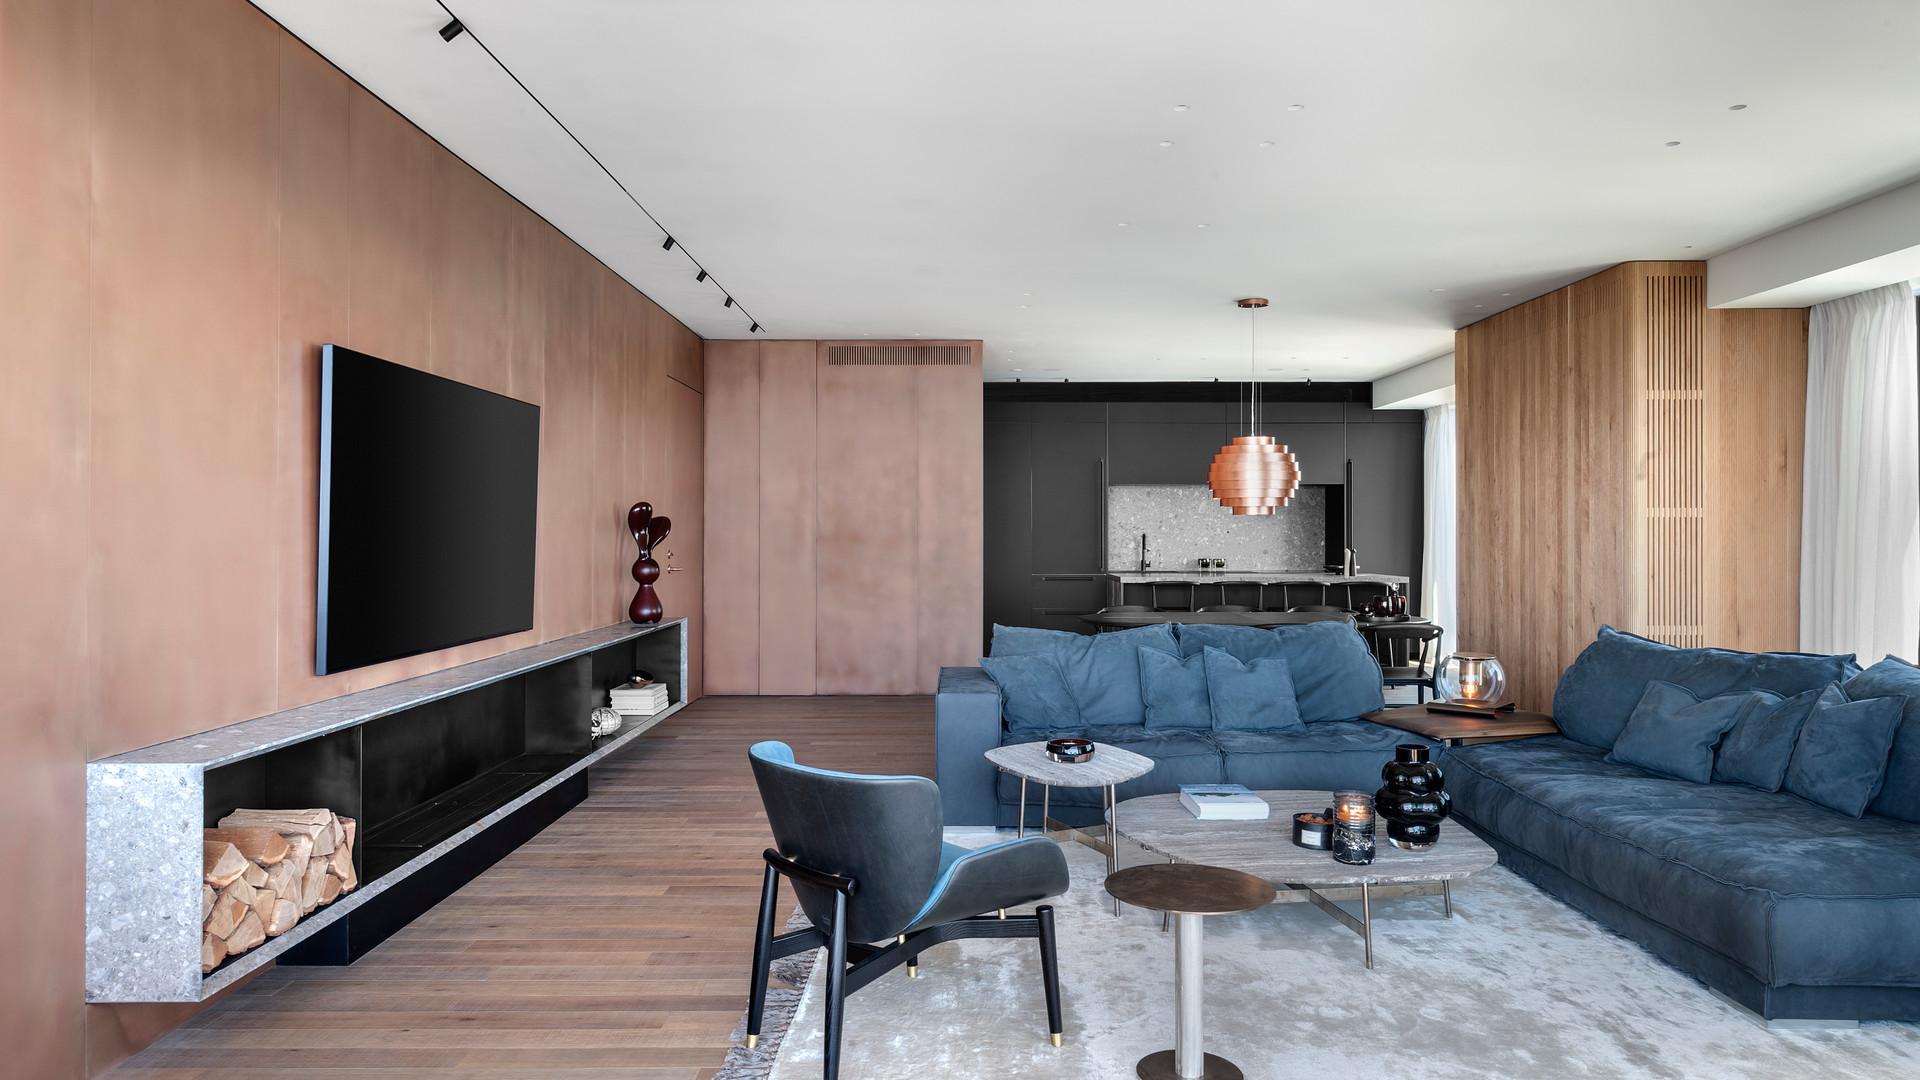 BLUSH - Apartment in Tel Aviv. Photographer : Oded Smadar.